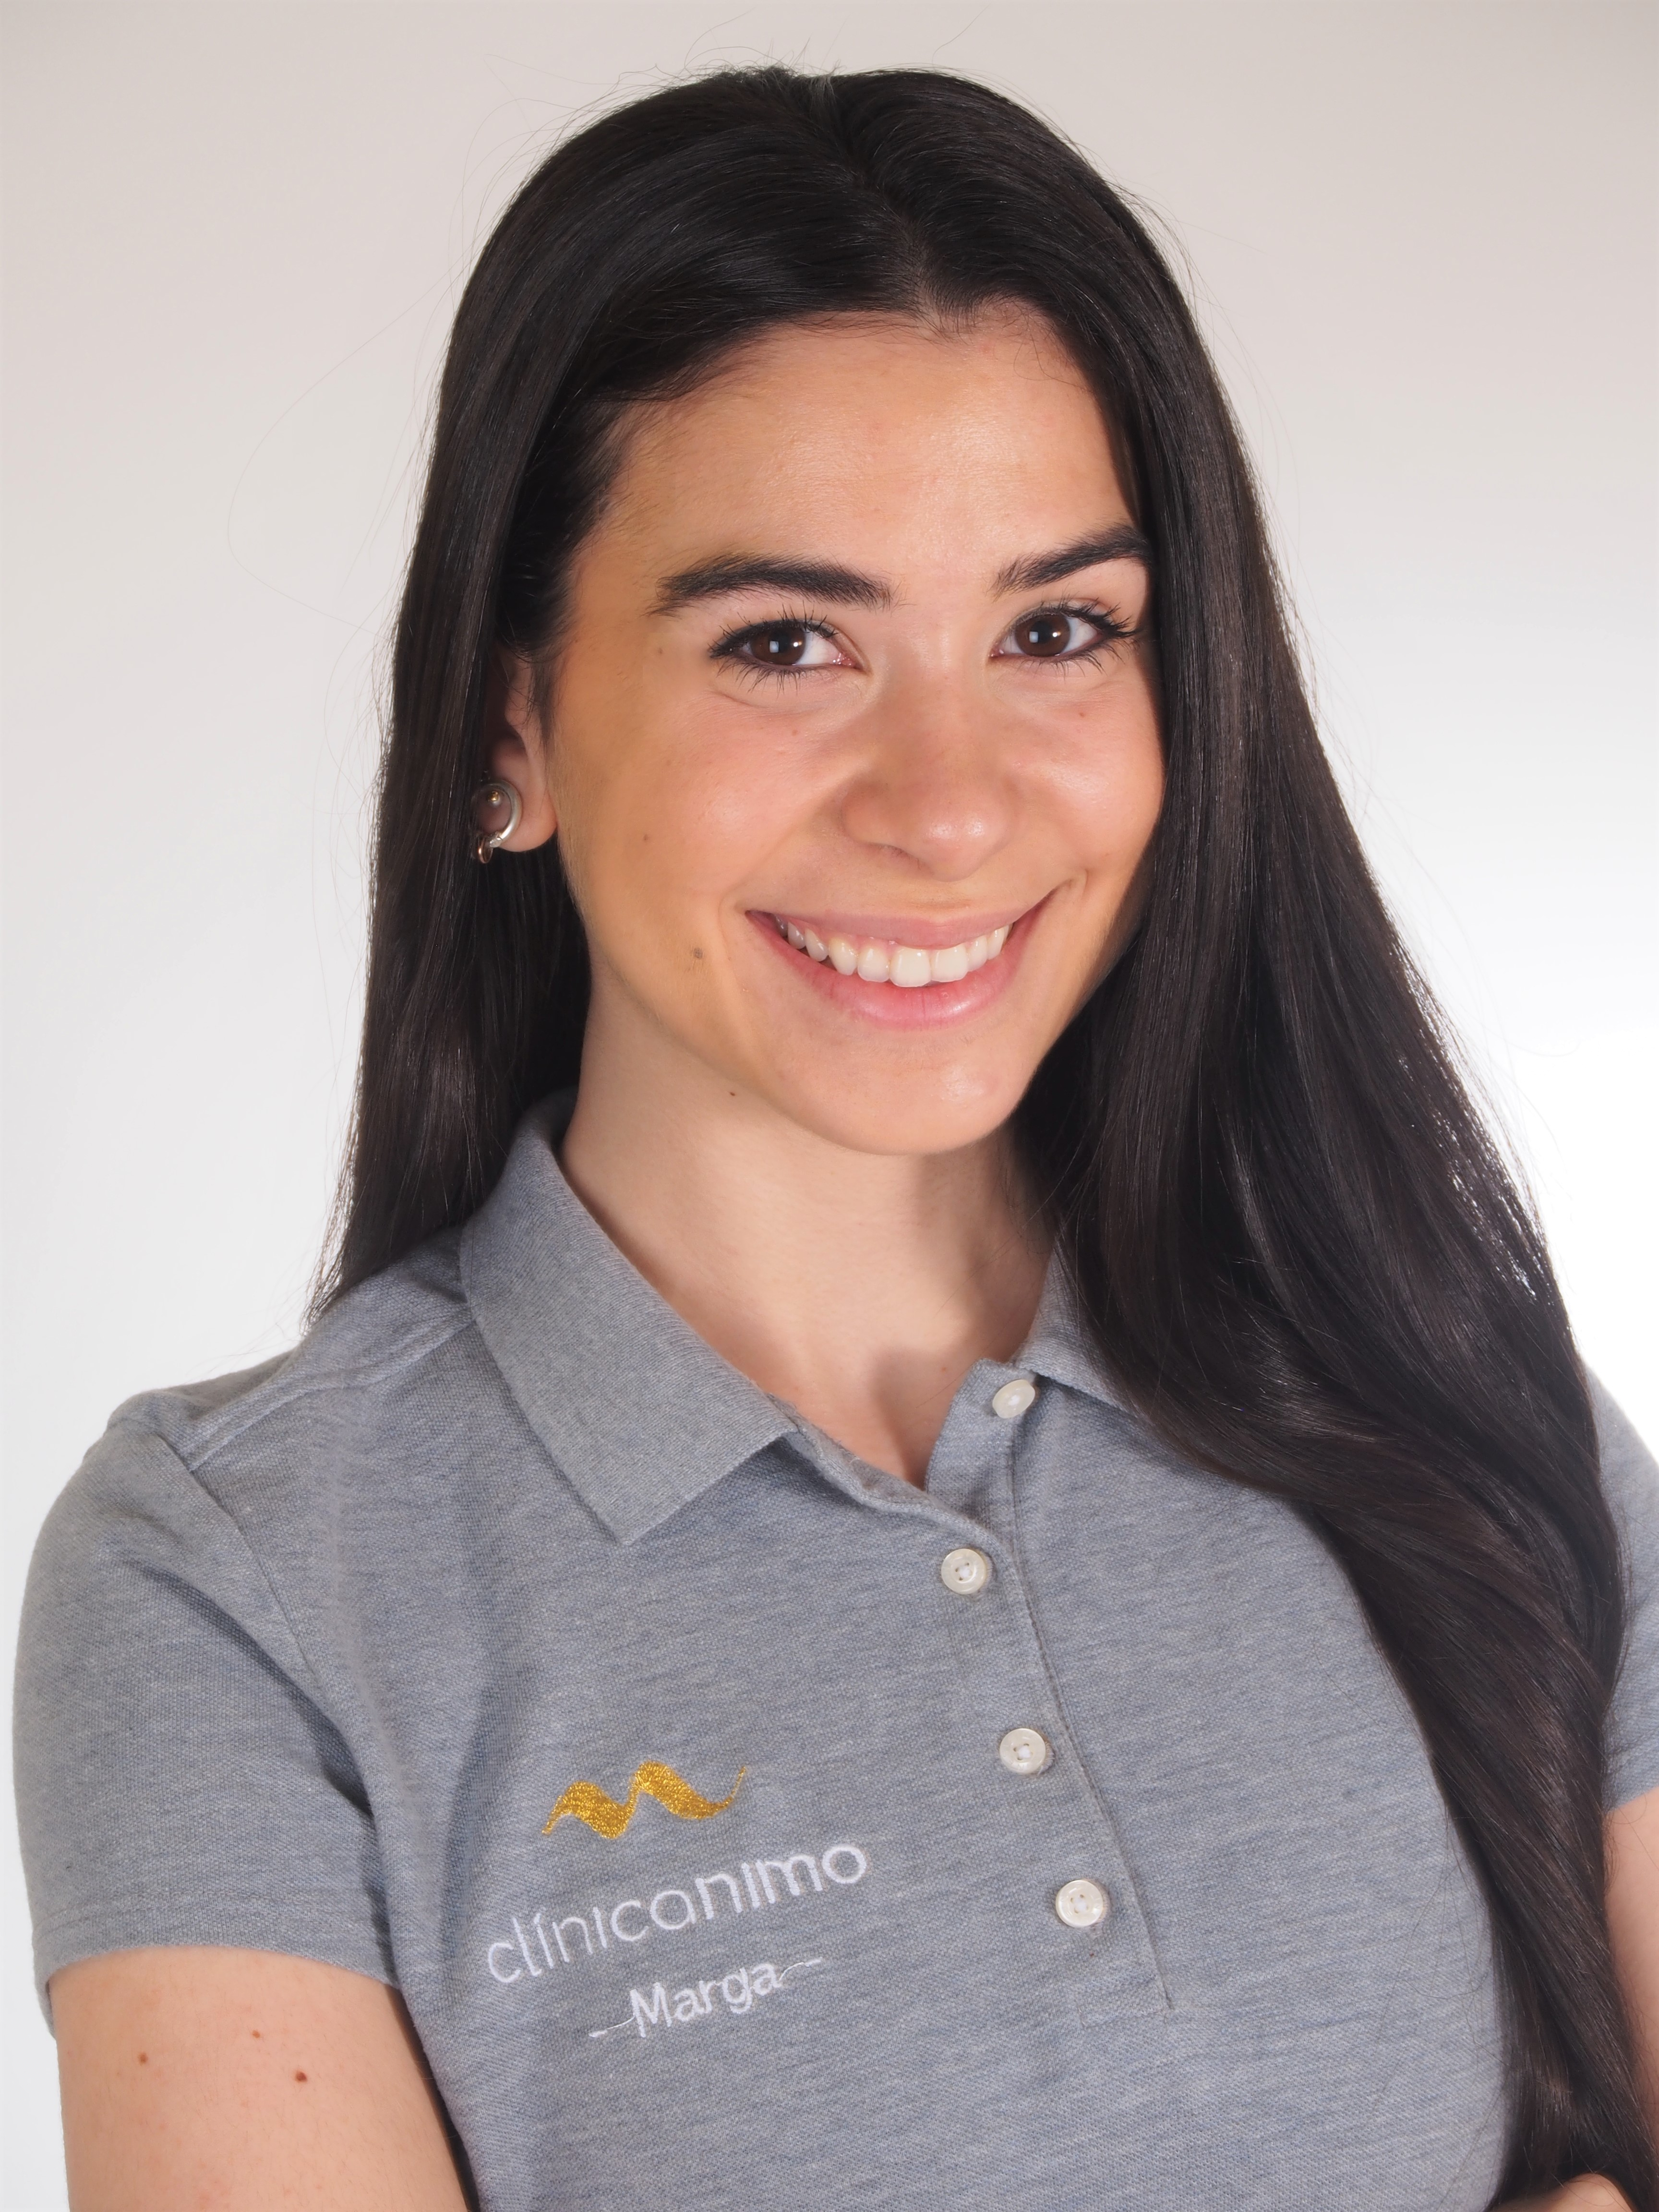 Dr. Margarita Durán ODONTOLOGÍA